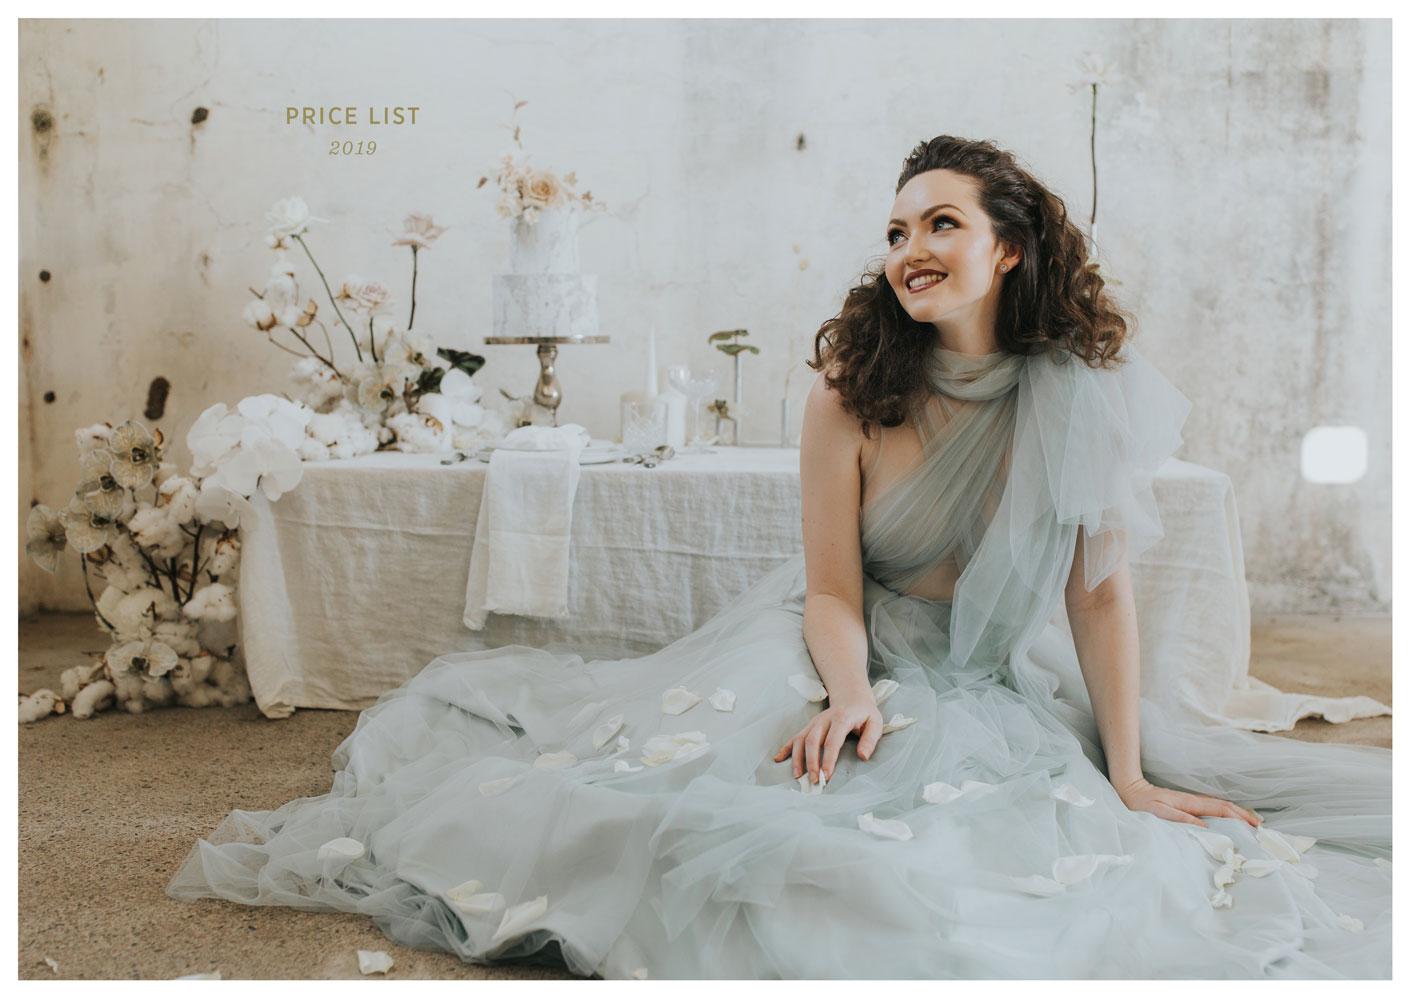 MallorySparkles_Weddings_20193.jpg